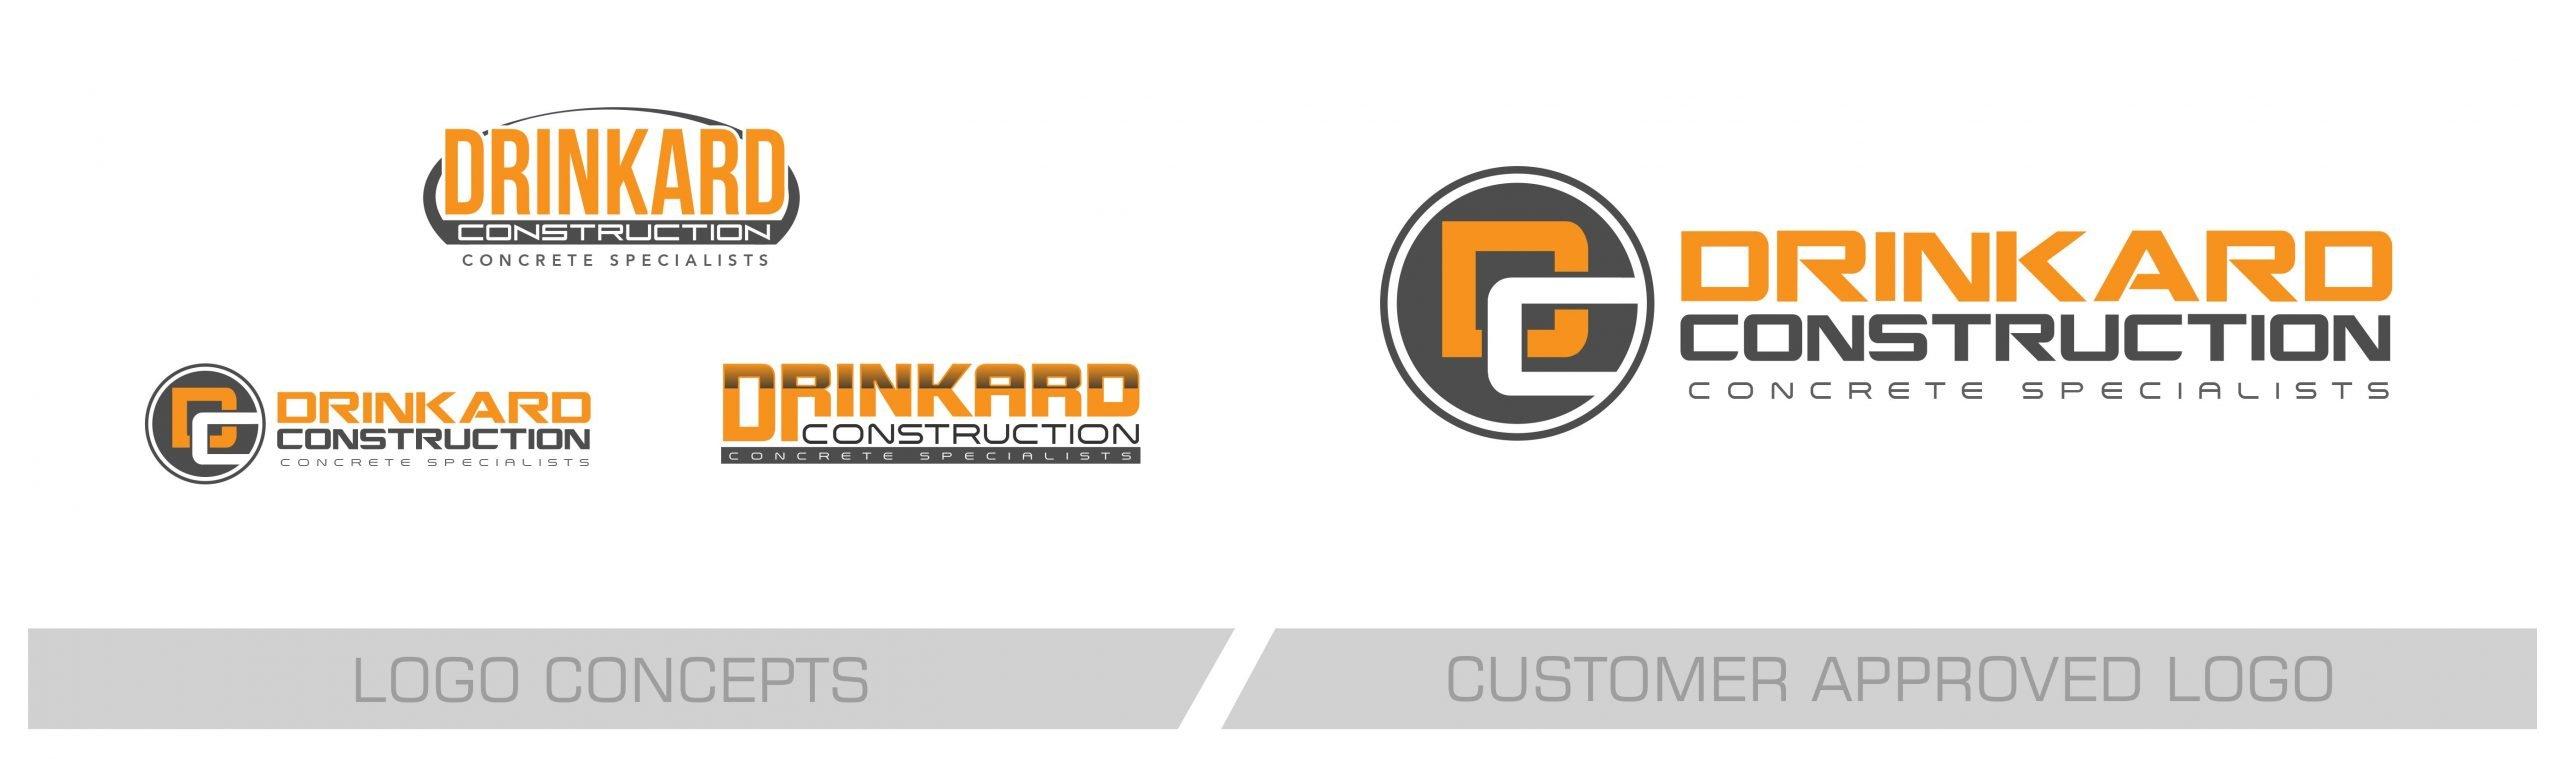 Drinkard Construction Logo Design